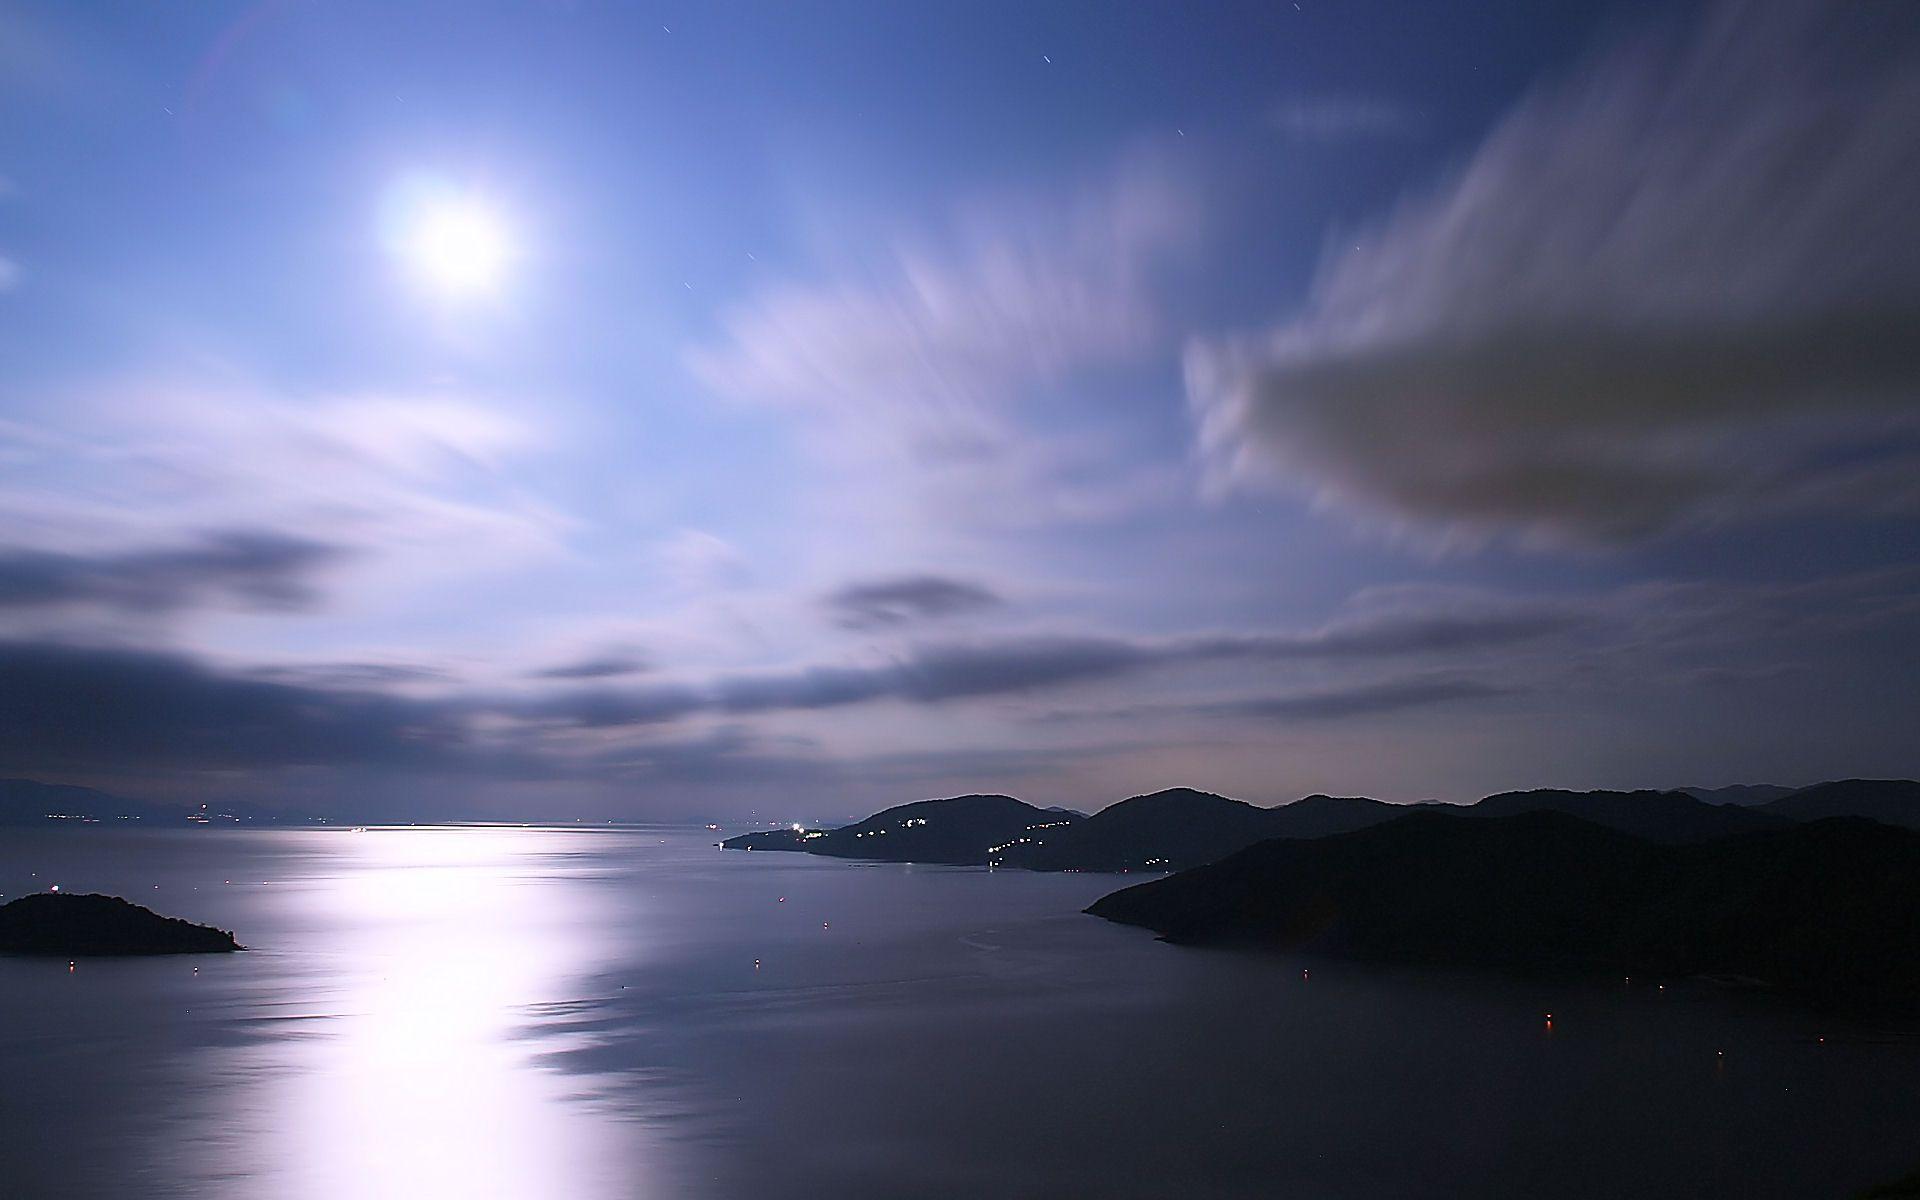 夜景 花火 イルミ 月光に光る瀬戸内海の夜景 壁紙19x10 壁紙館 夜景 壁紙 瀬戸内海 風景